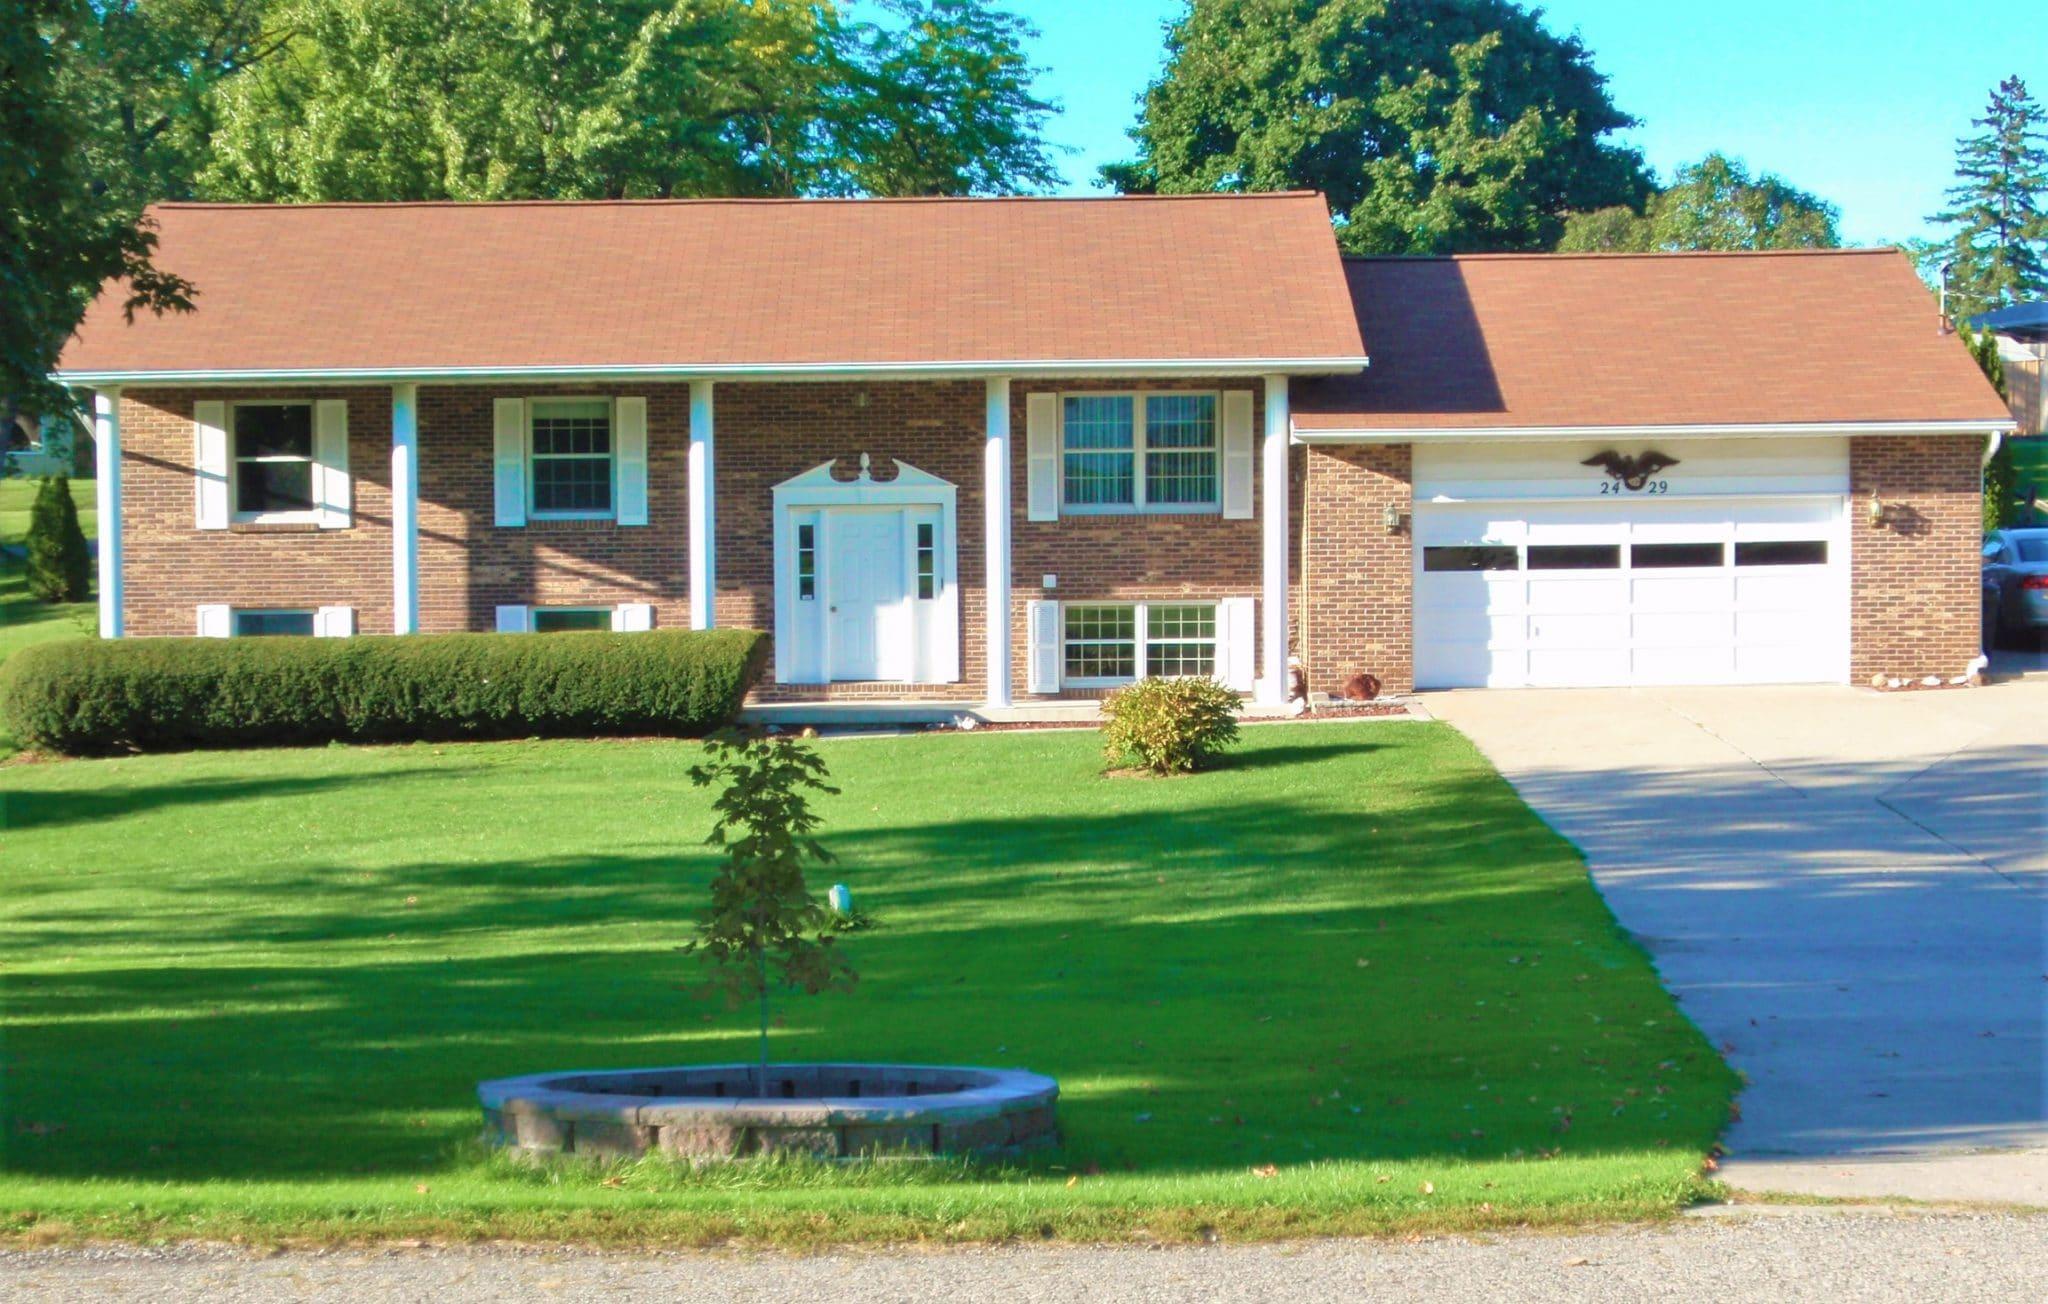 Sullivans Wholesale Home Decor Homes For Sale In Grand Blanc Mi 2429 Valley Lane Drive